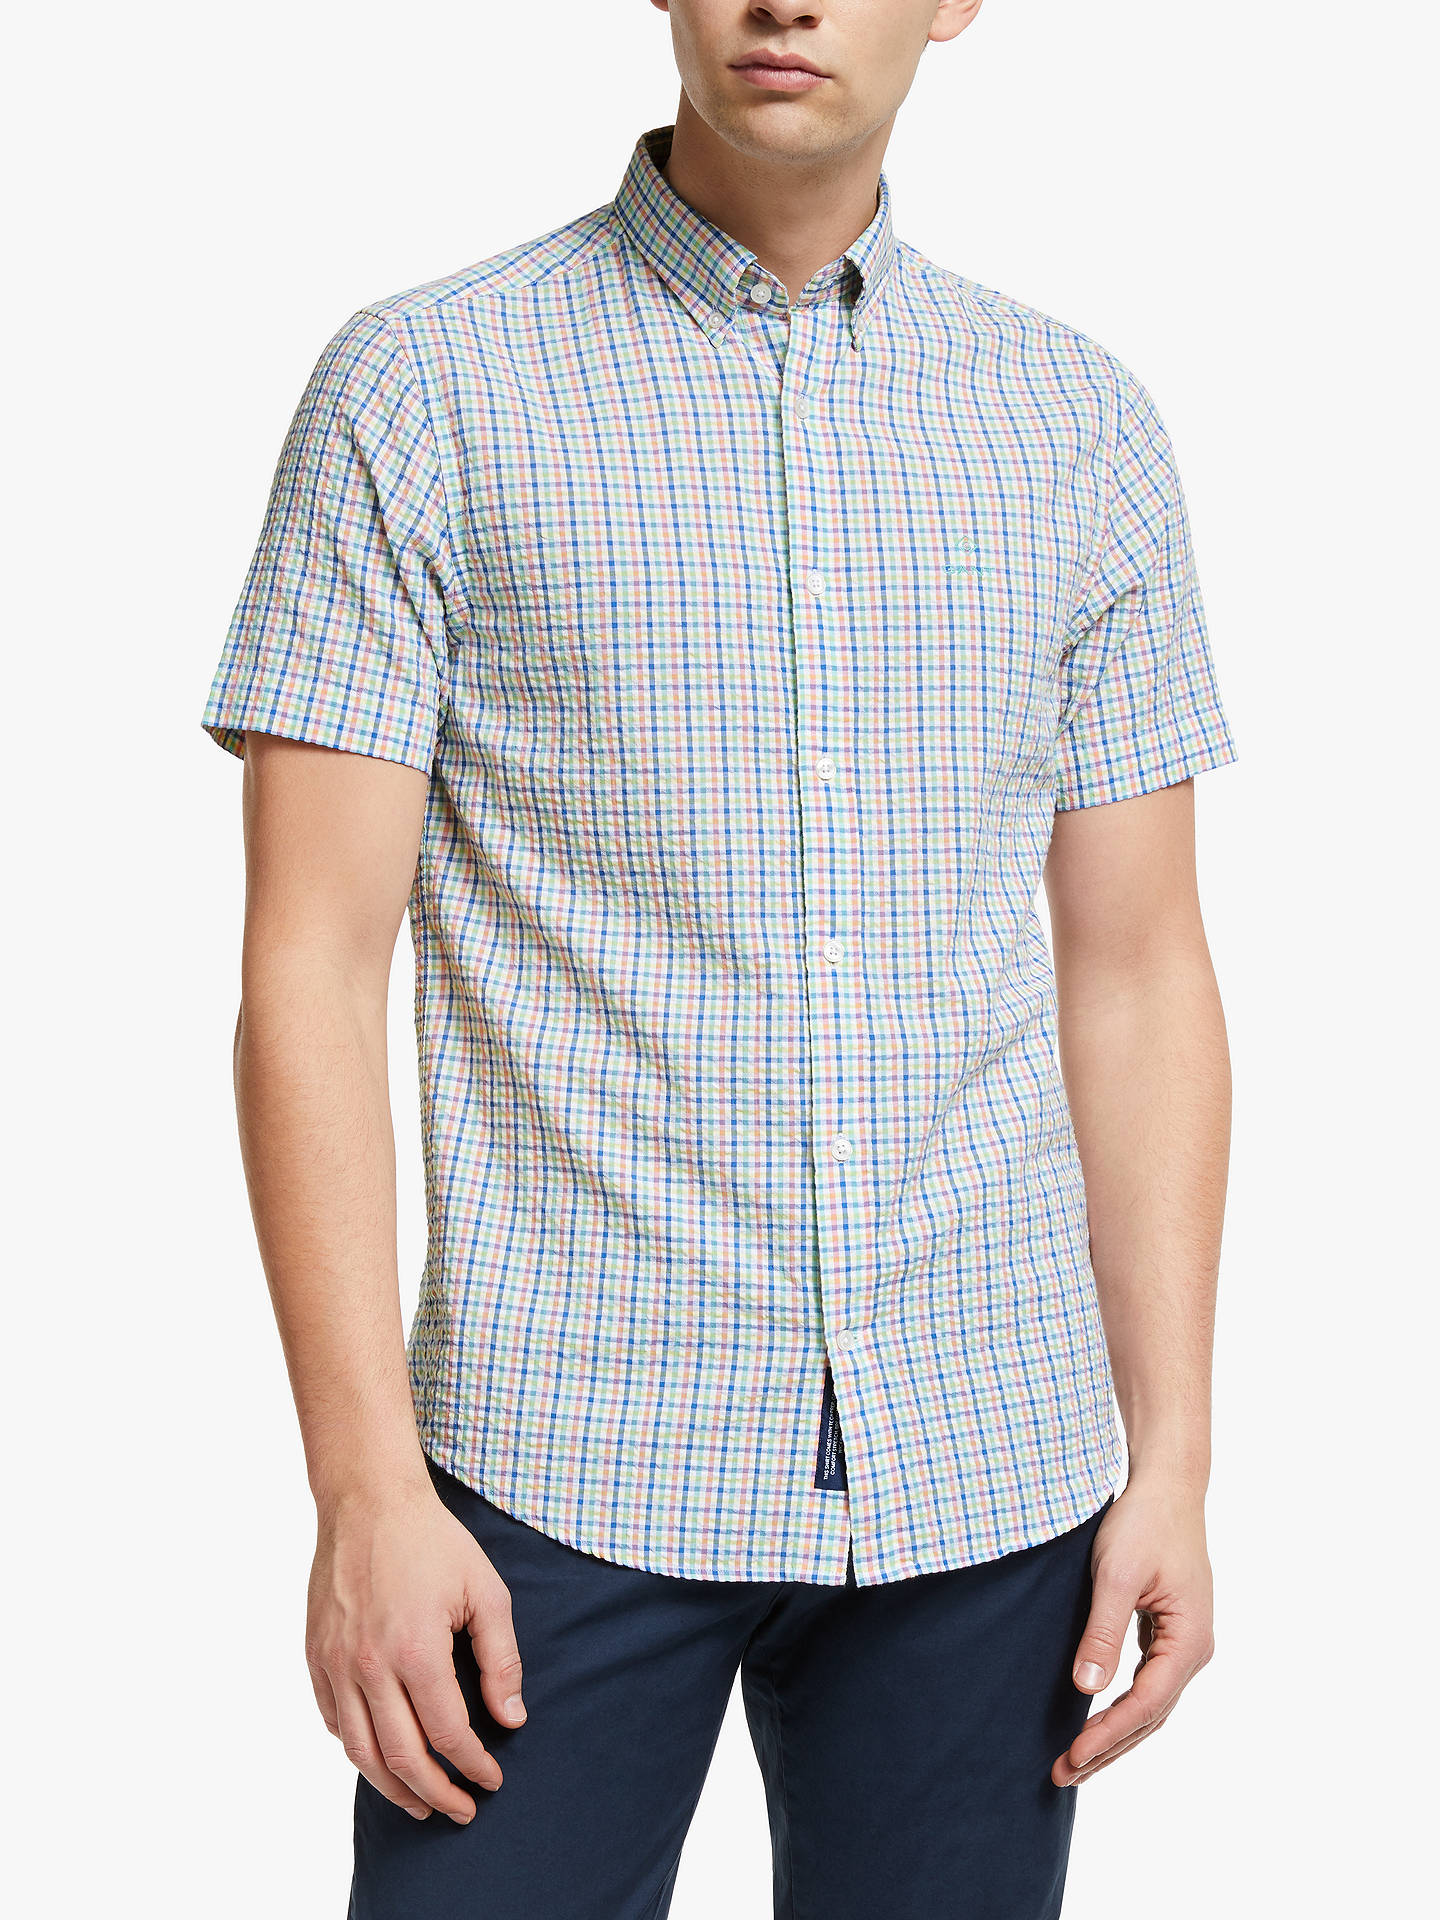 a6126a75991 Buy GANT Tech Prep Seersucker Multi Check Short Sleeve Shirt, White/Multi,  S ...